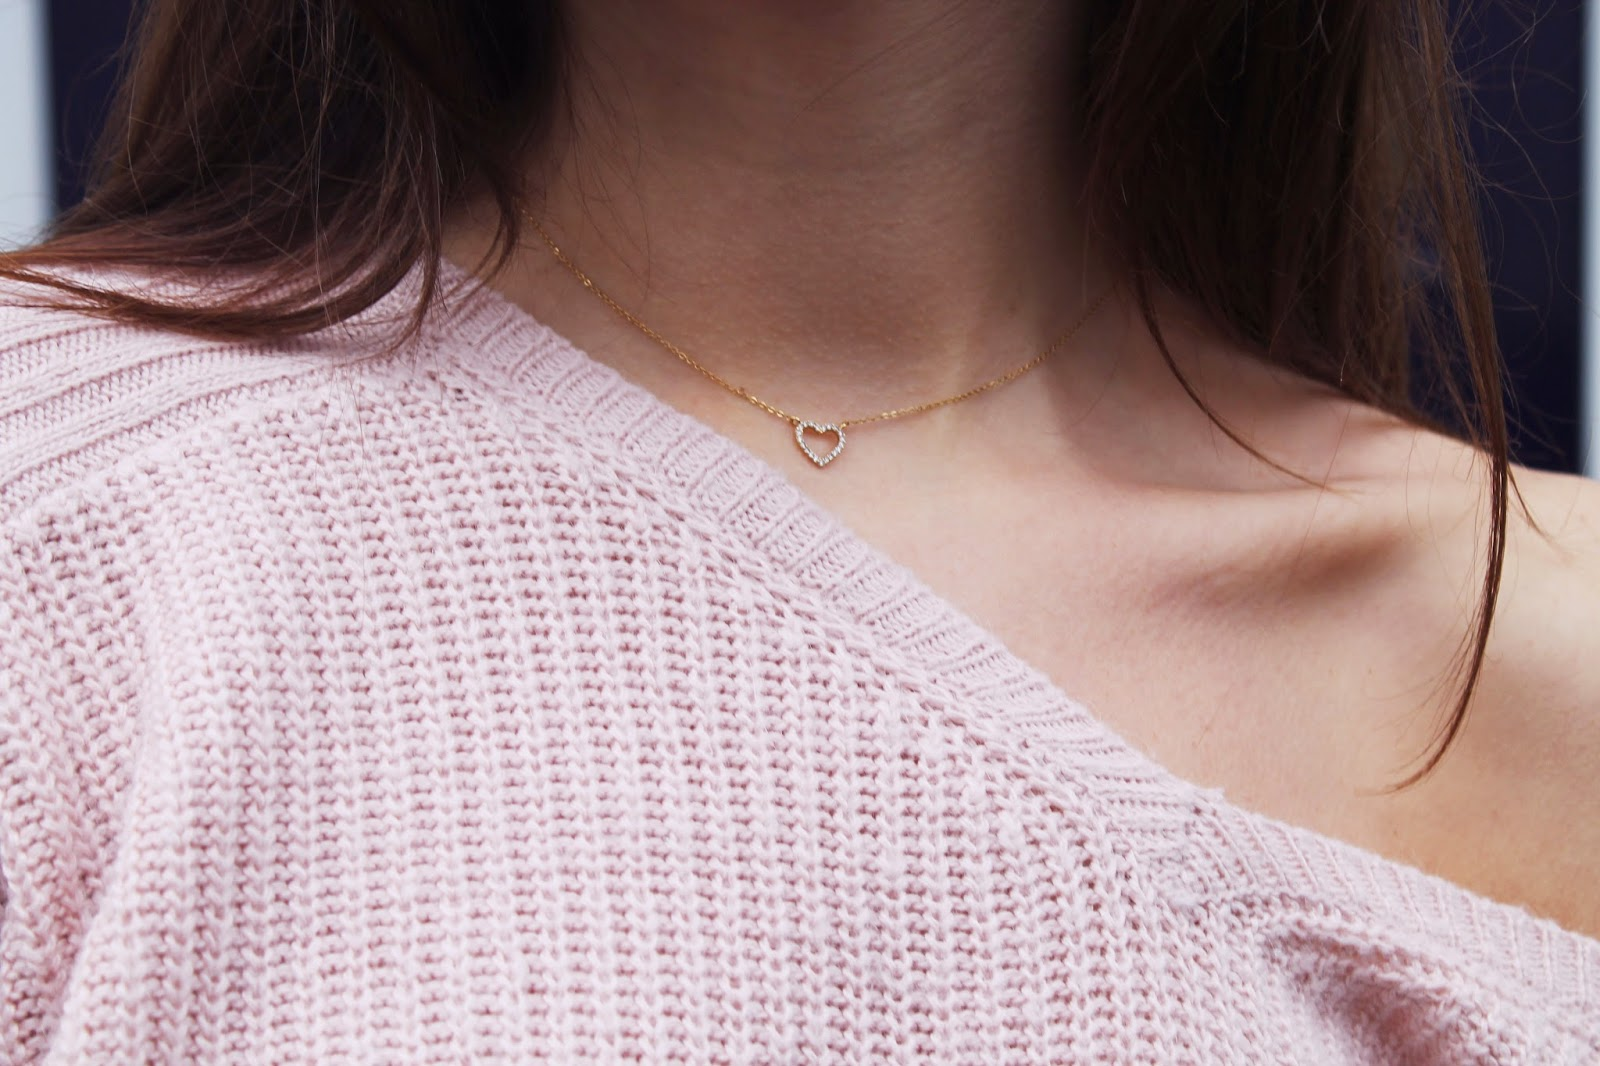 z for accessorize, accessorize, zara simon, jewellery